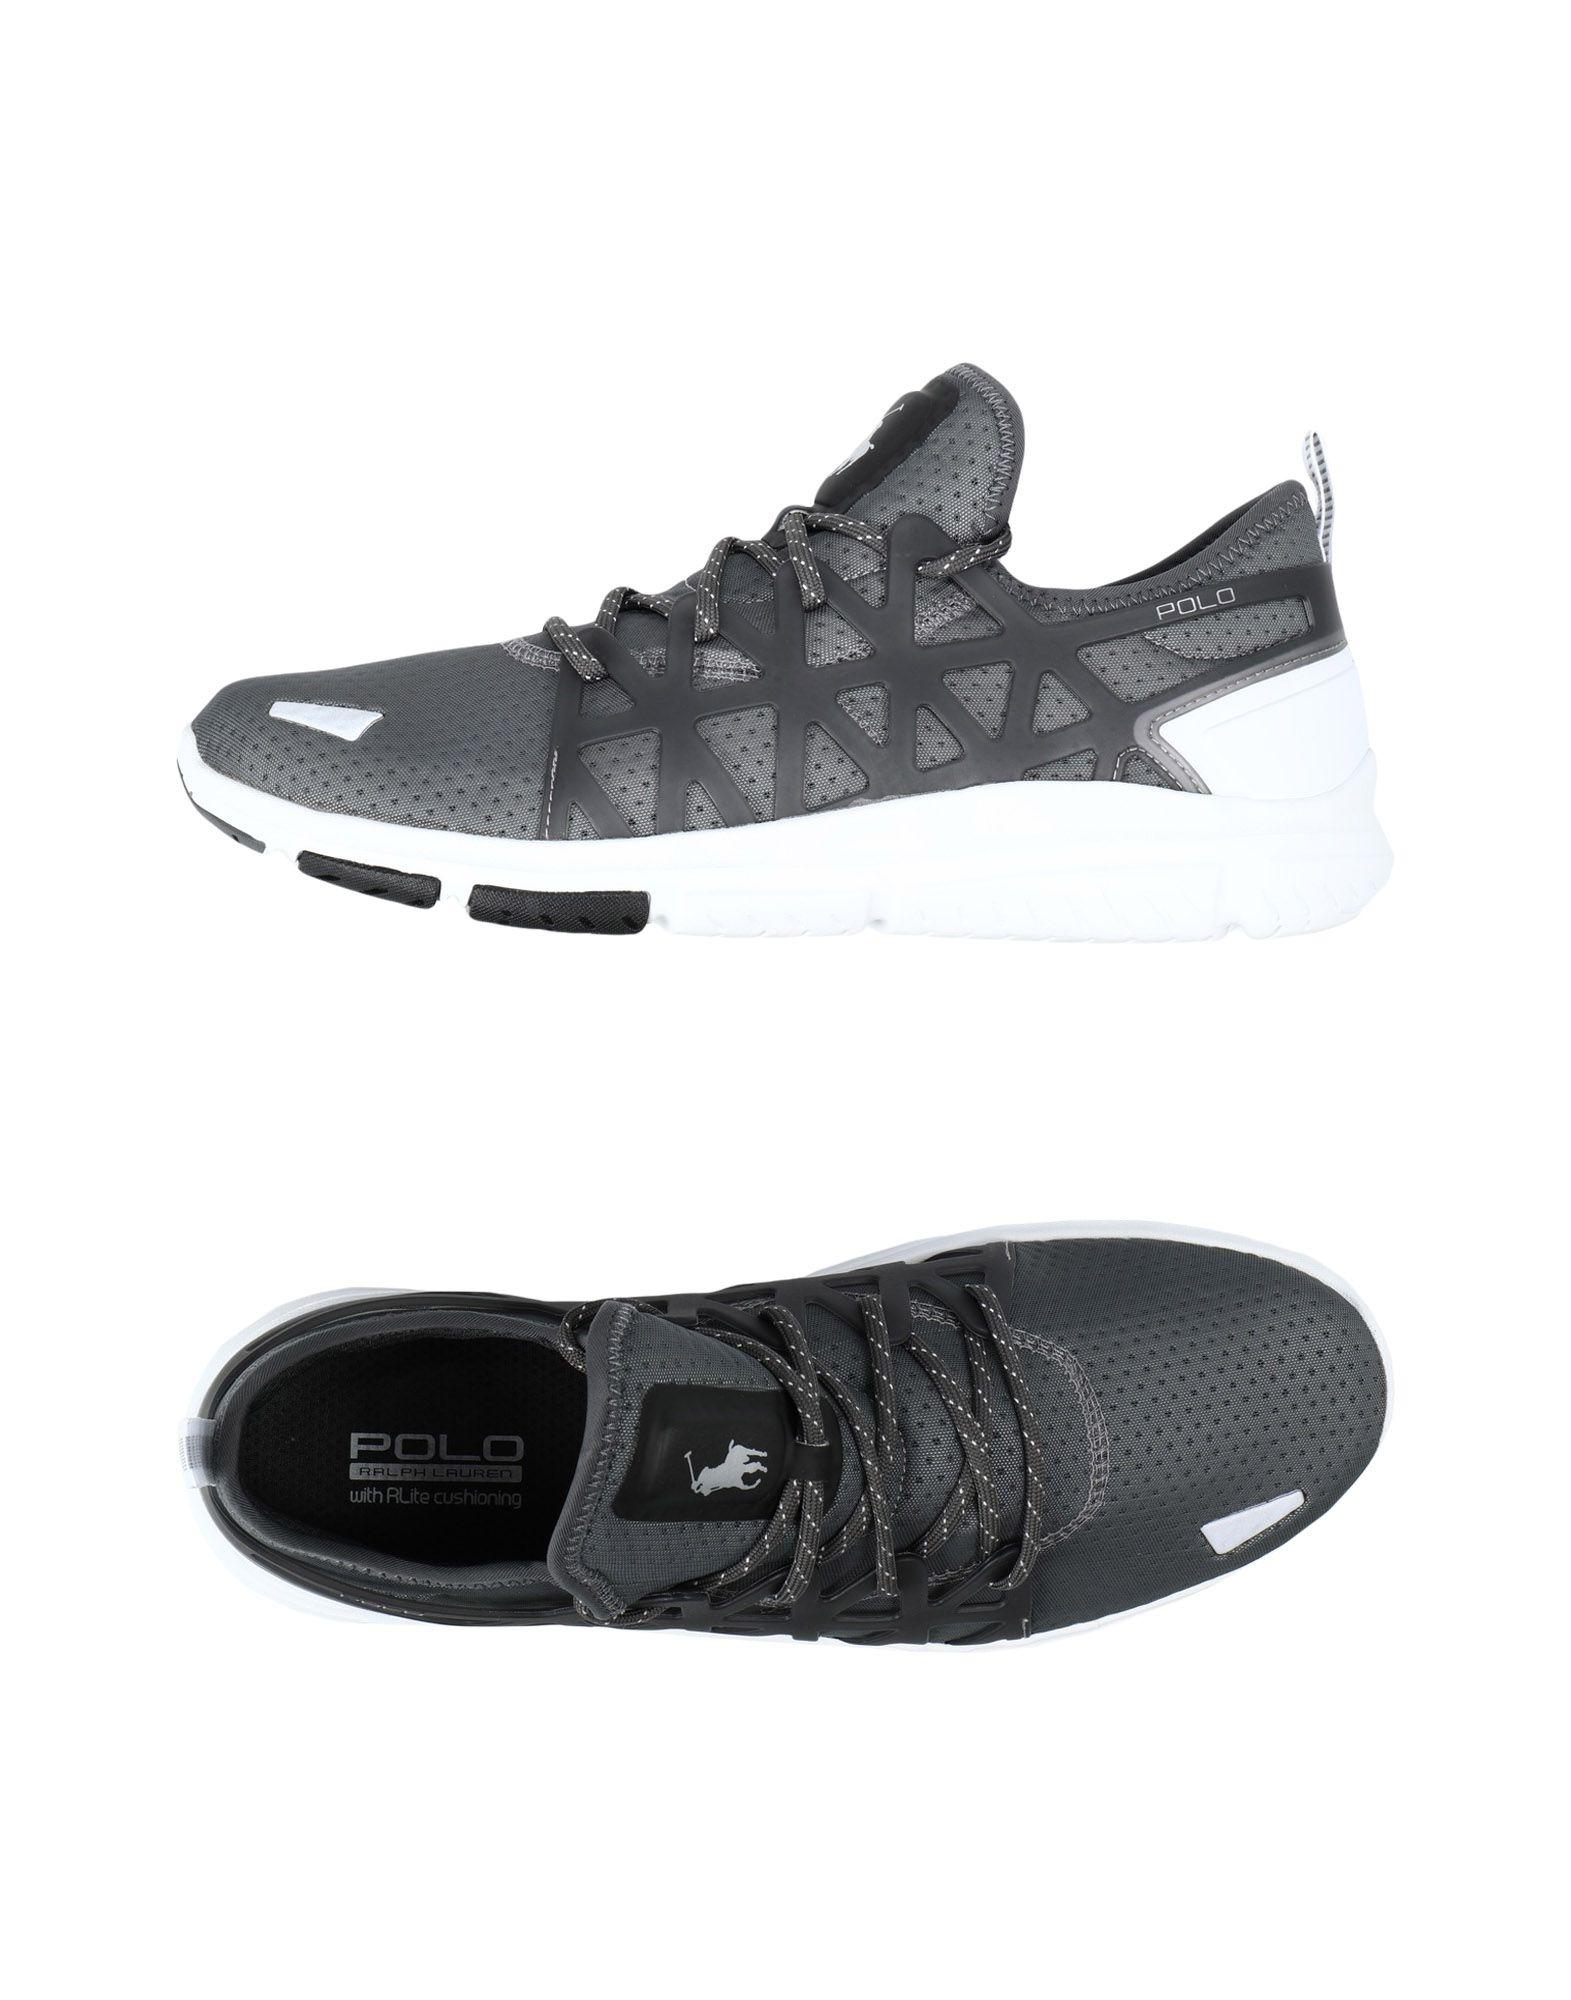 Polo Ralph Lauren Sneakers Herren  11539223EG Gute Qualität beliebte Schuhe